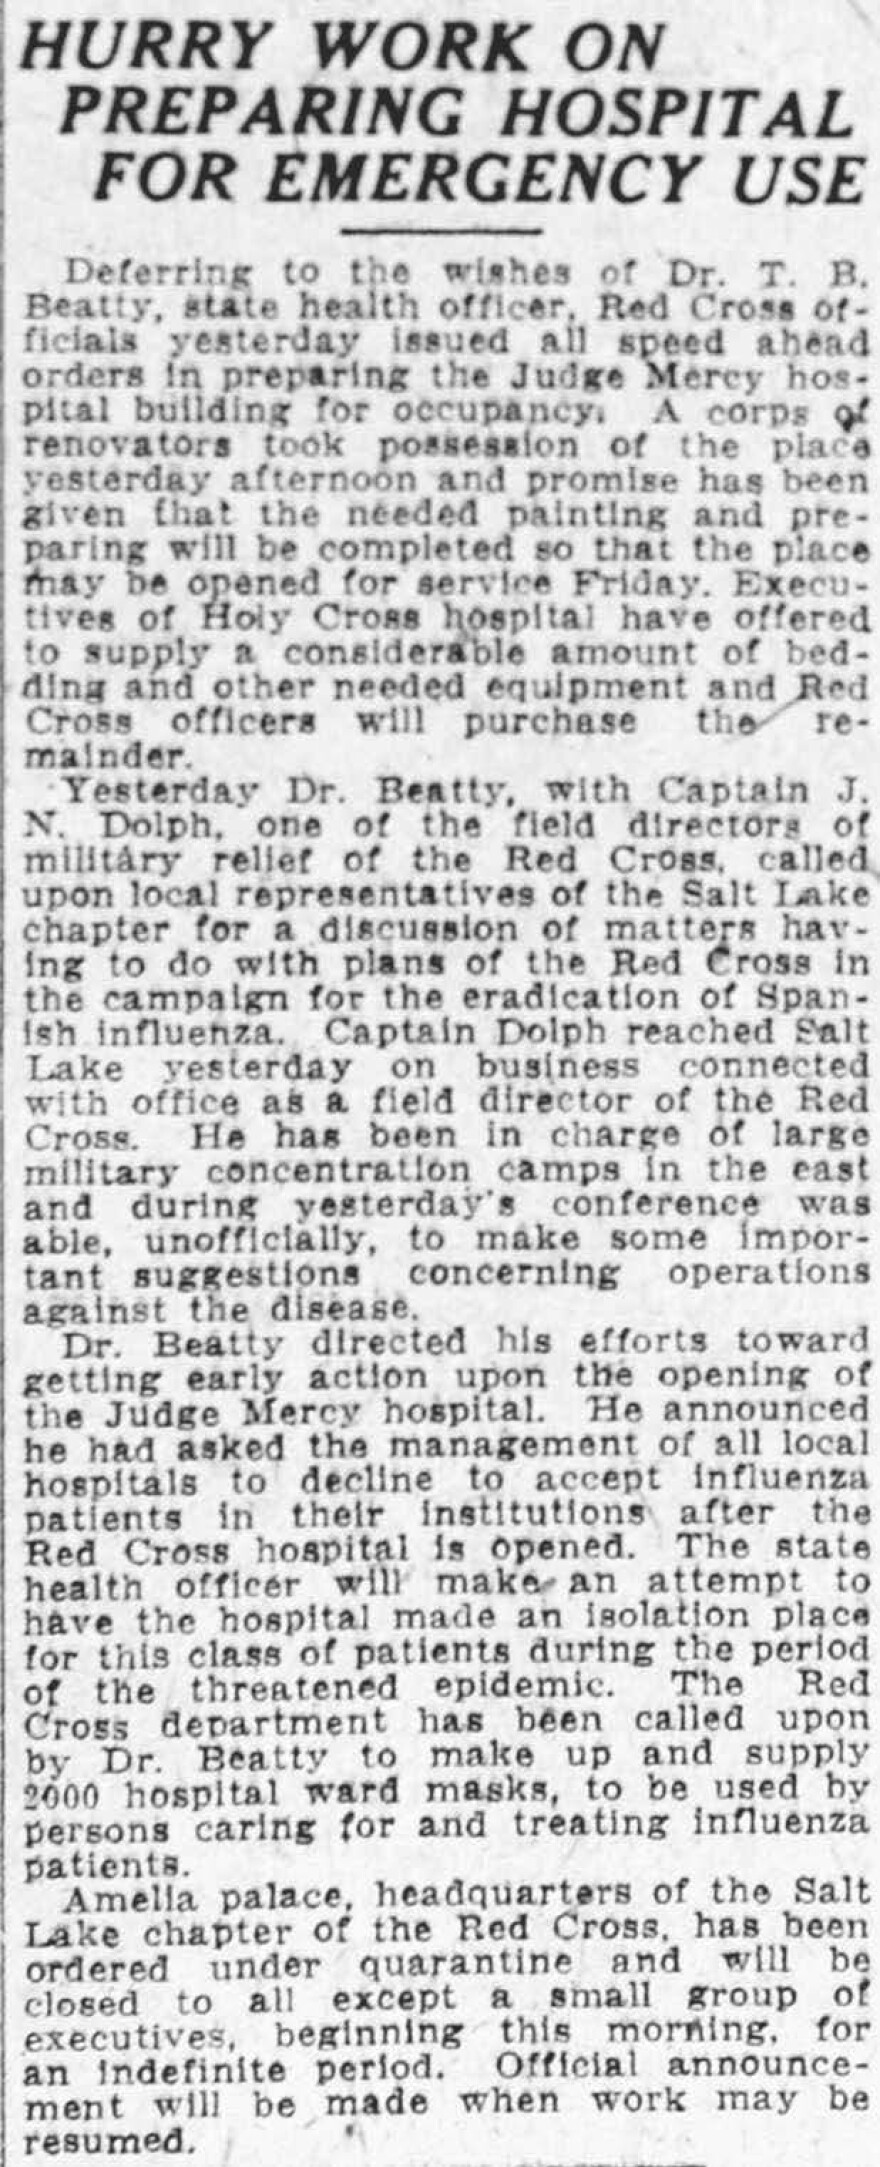 FLU COVID 5-Salt_Lake_Tribune_1918_10_10_Hurry_Work_on_Preparing_Hospital_for_Emergency_Use.jpg